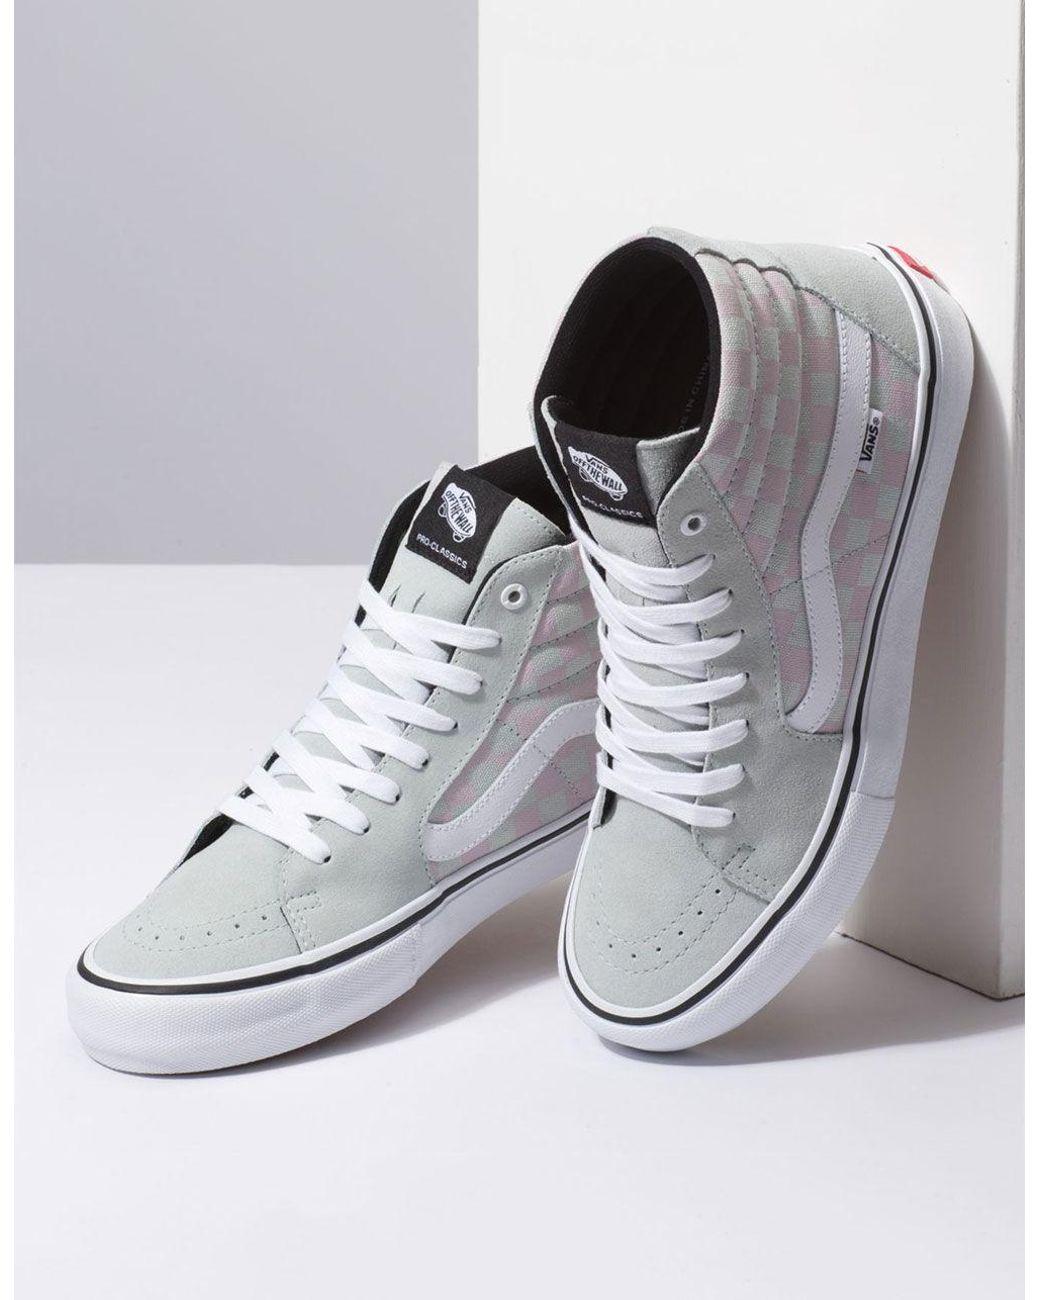 eec6d30d62 Lyst - Vans Checkerboard Sk8-hi Pro Smoke   Violet Ice Shoes for Men